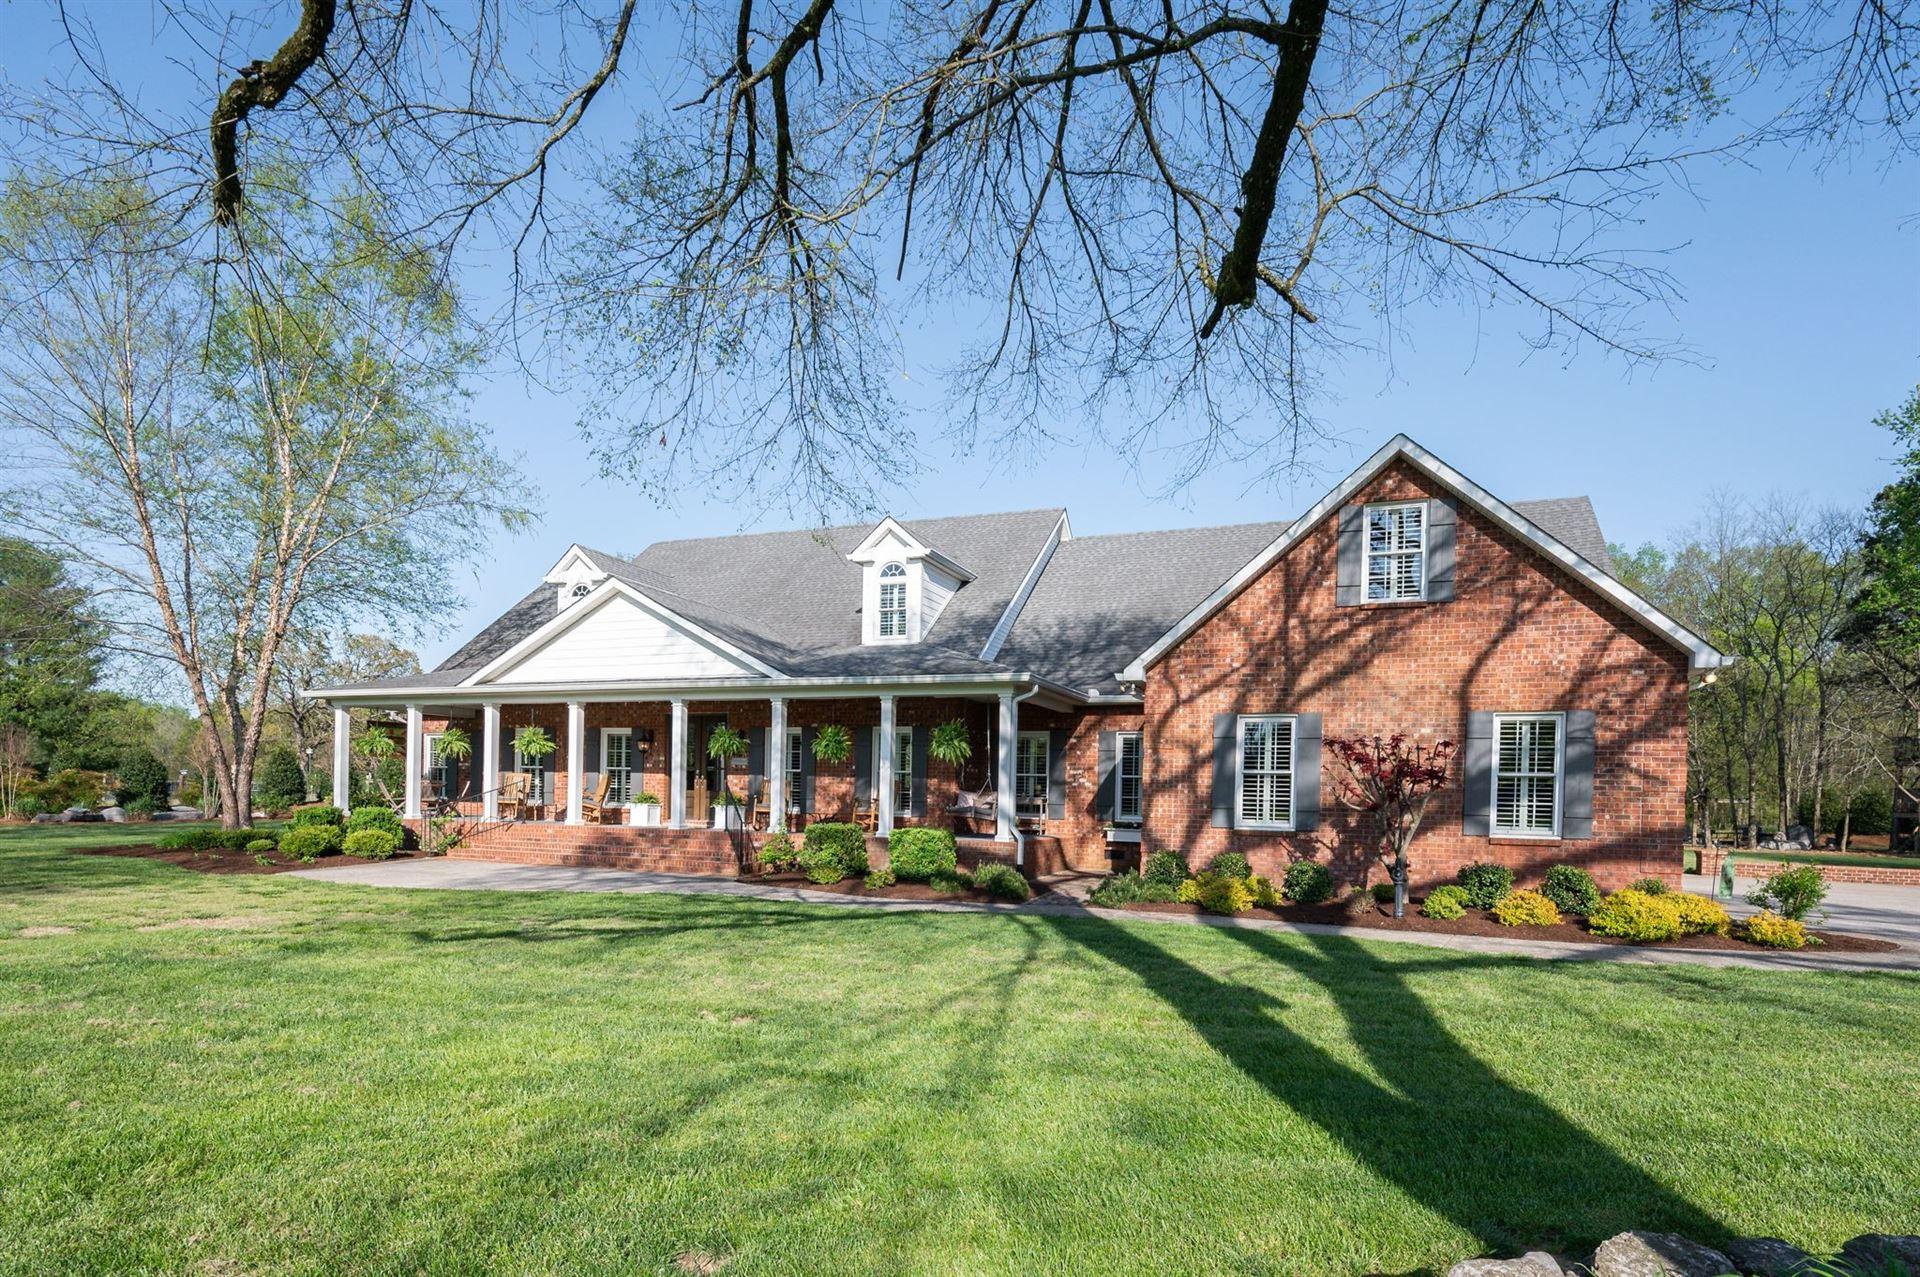 141 Spence Creek Lane, Murfreesboro, TN 37128 - MLS#: 2244447